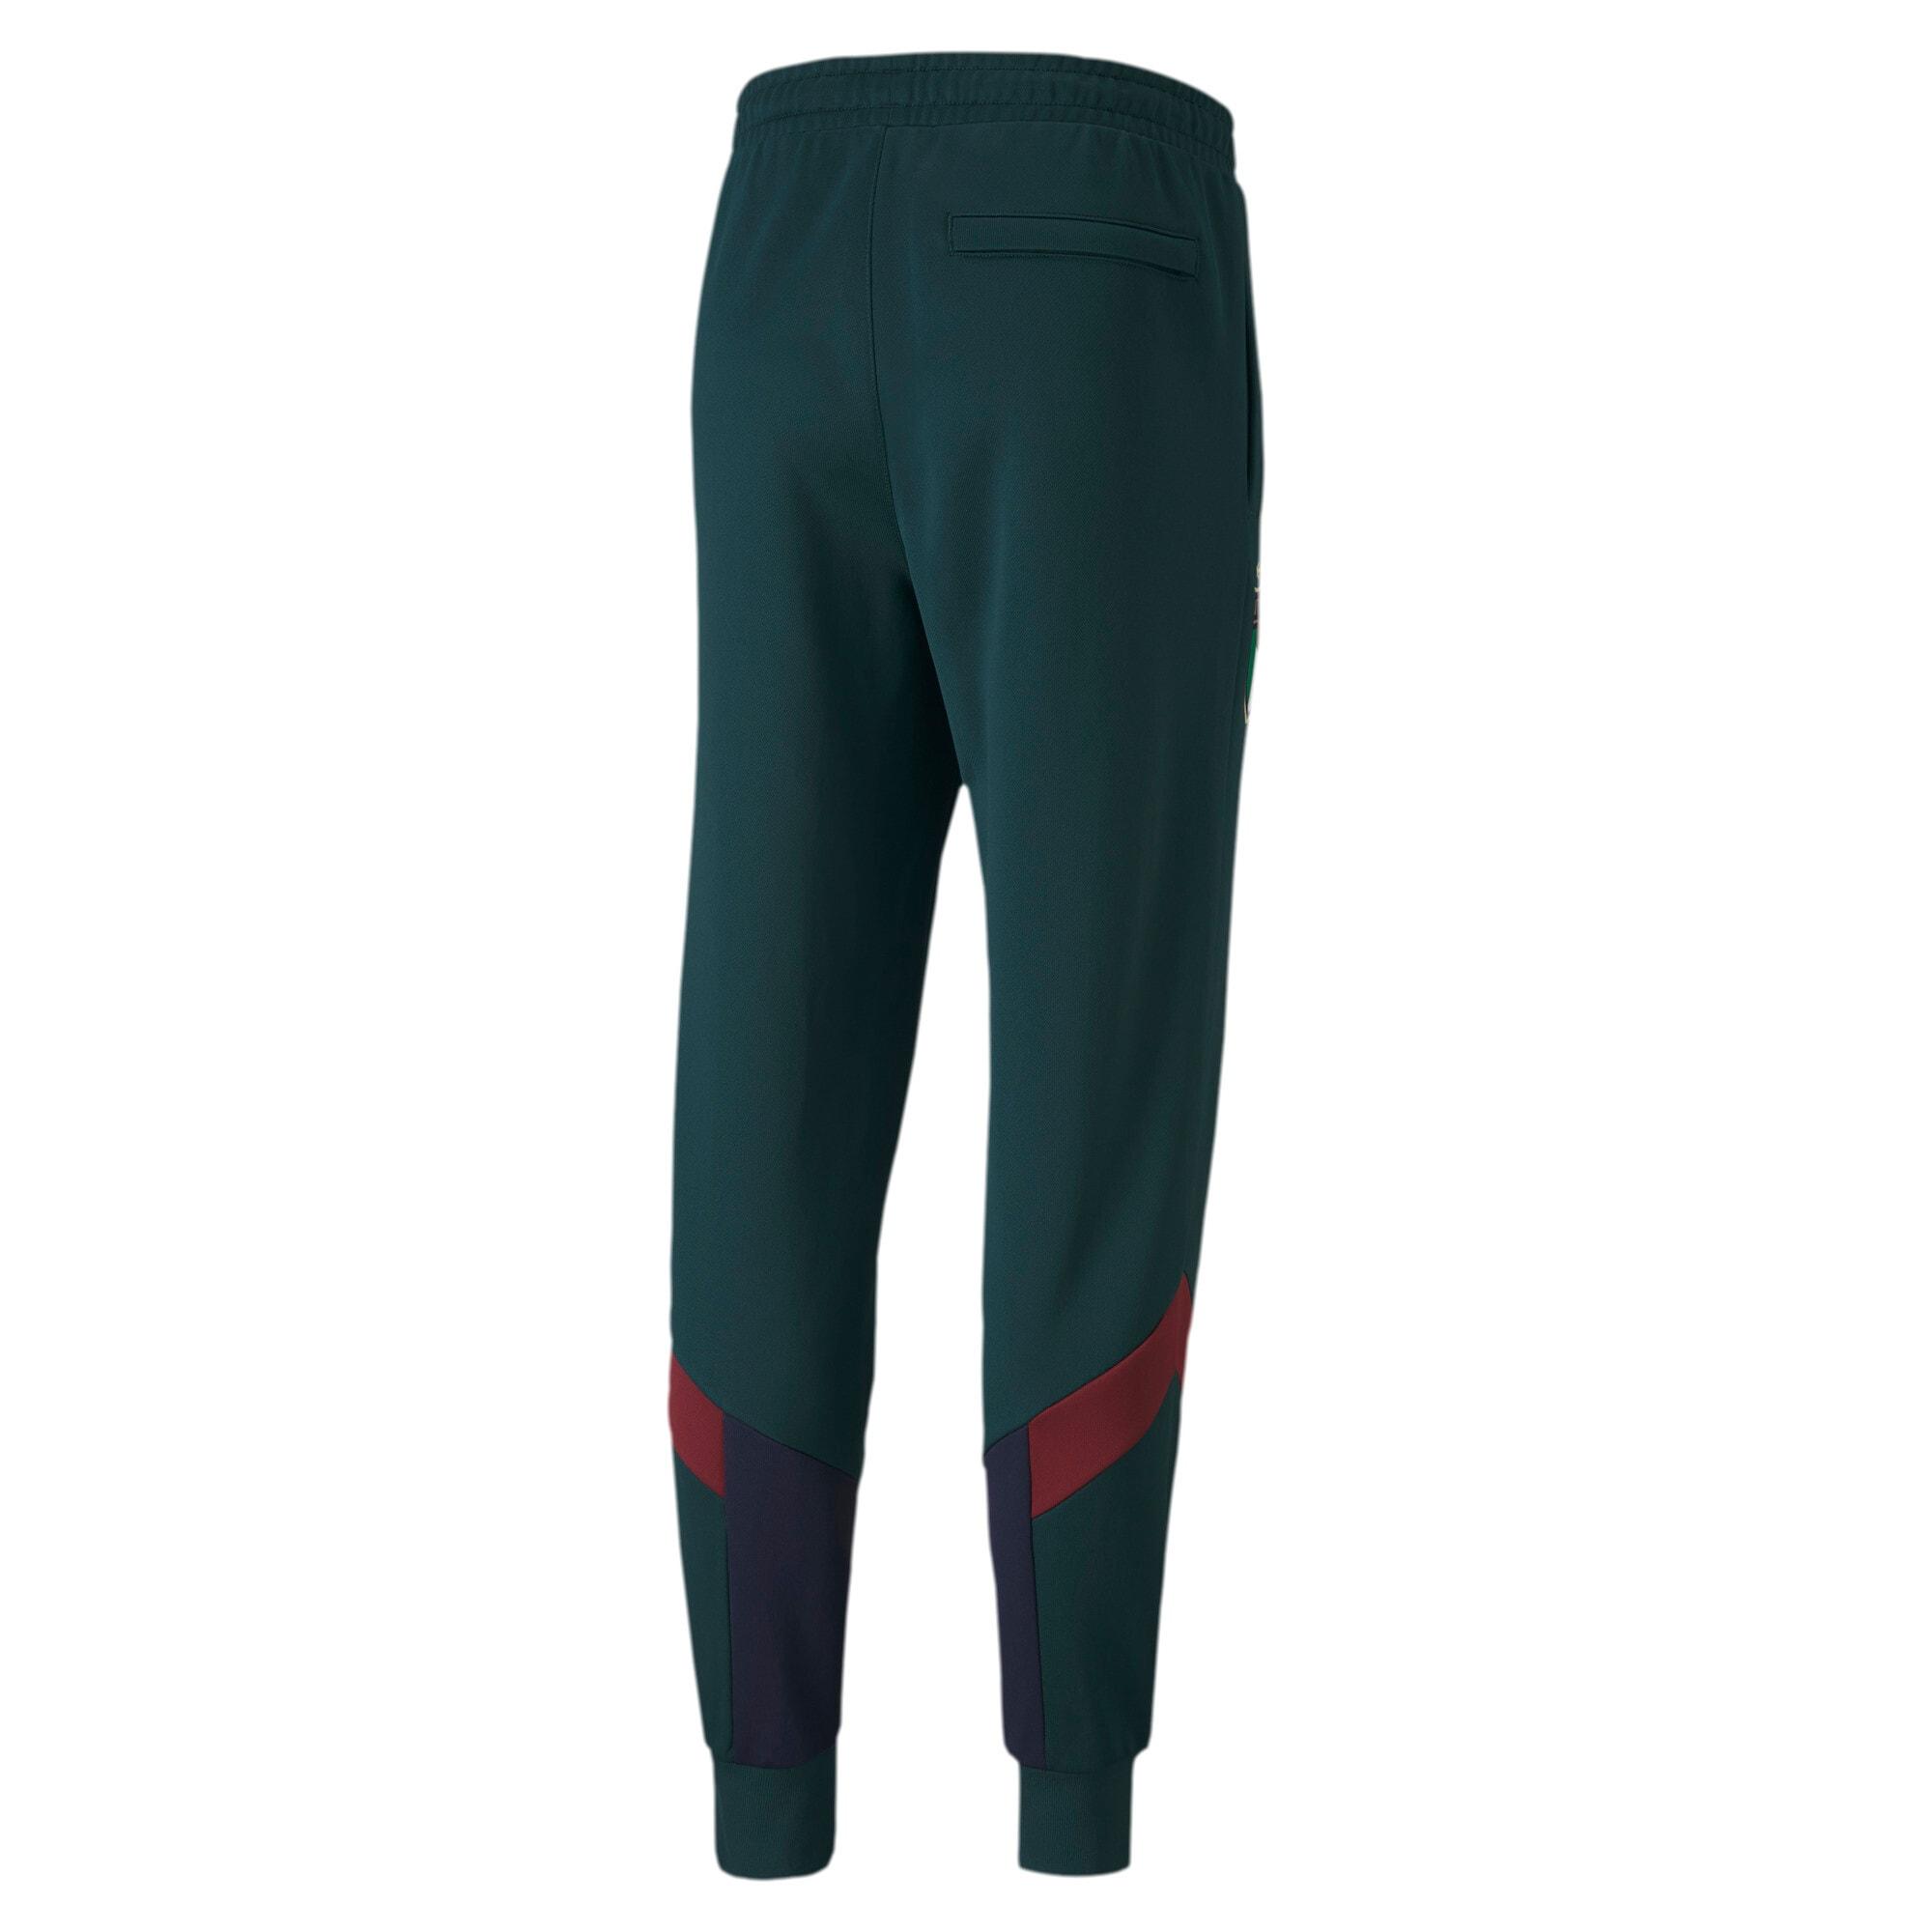 Thumbnail 2 of FIGC Iconic MCS Men's Track Pants, Ponderosa Pine-Peacoat, medium